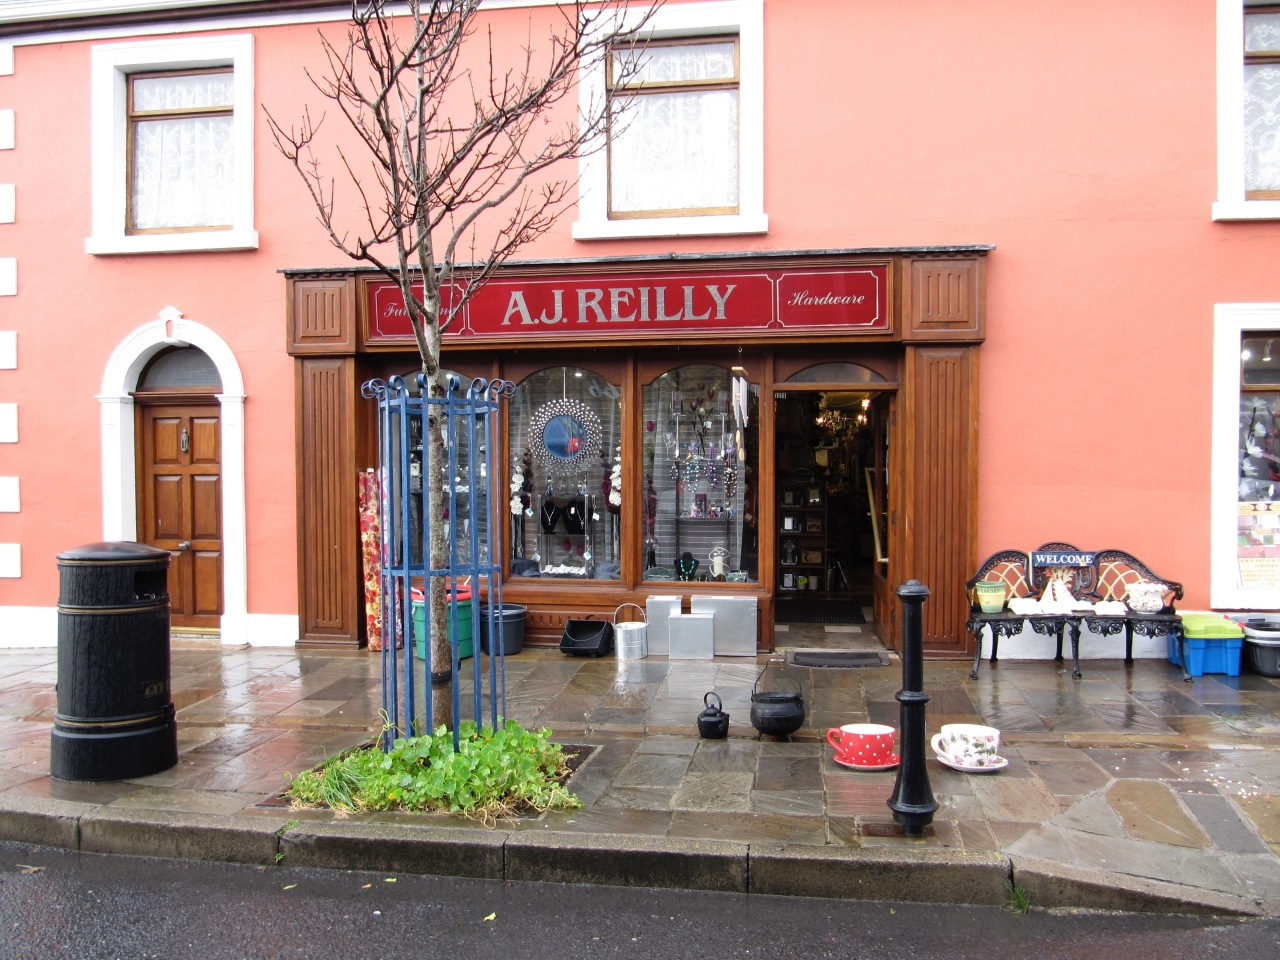 A.J. Reilly - Purveyor of Everything.